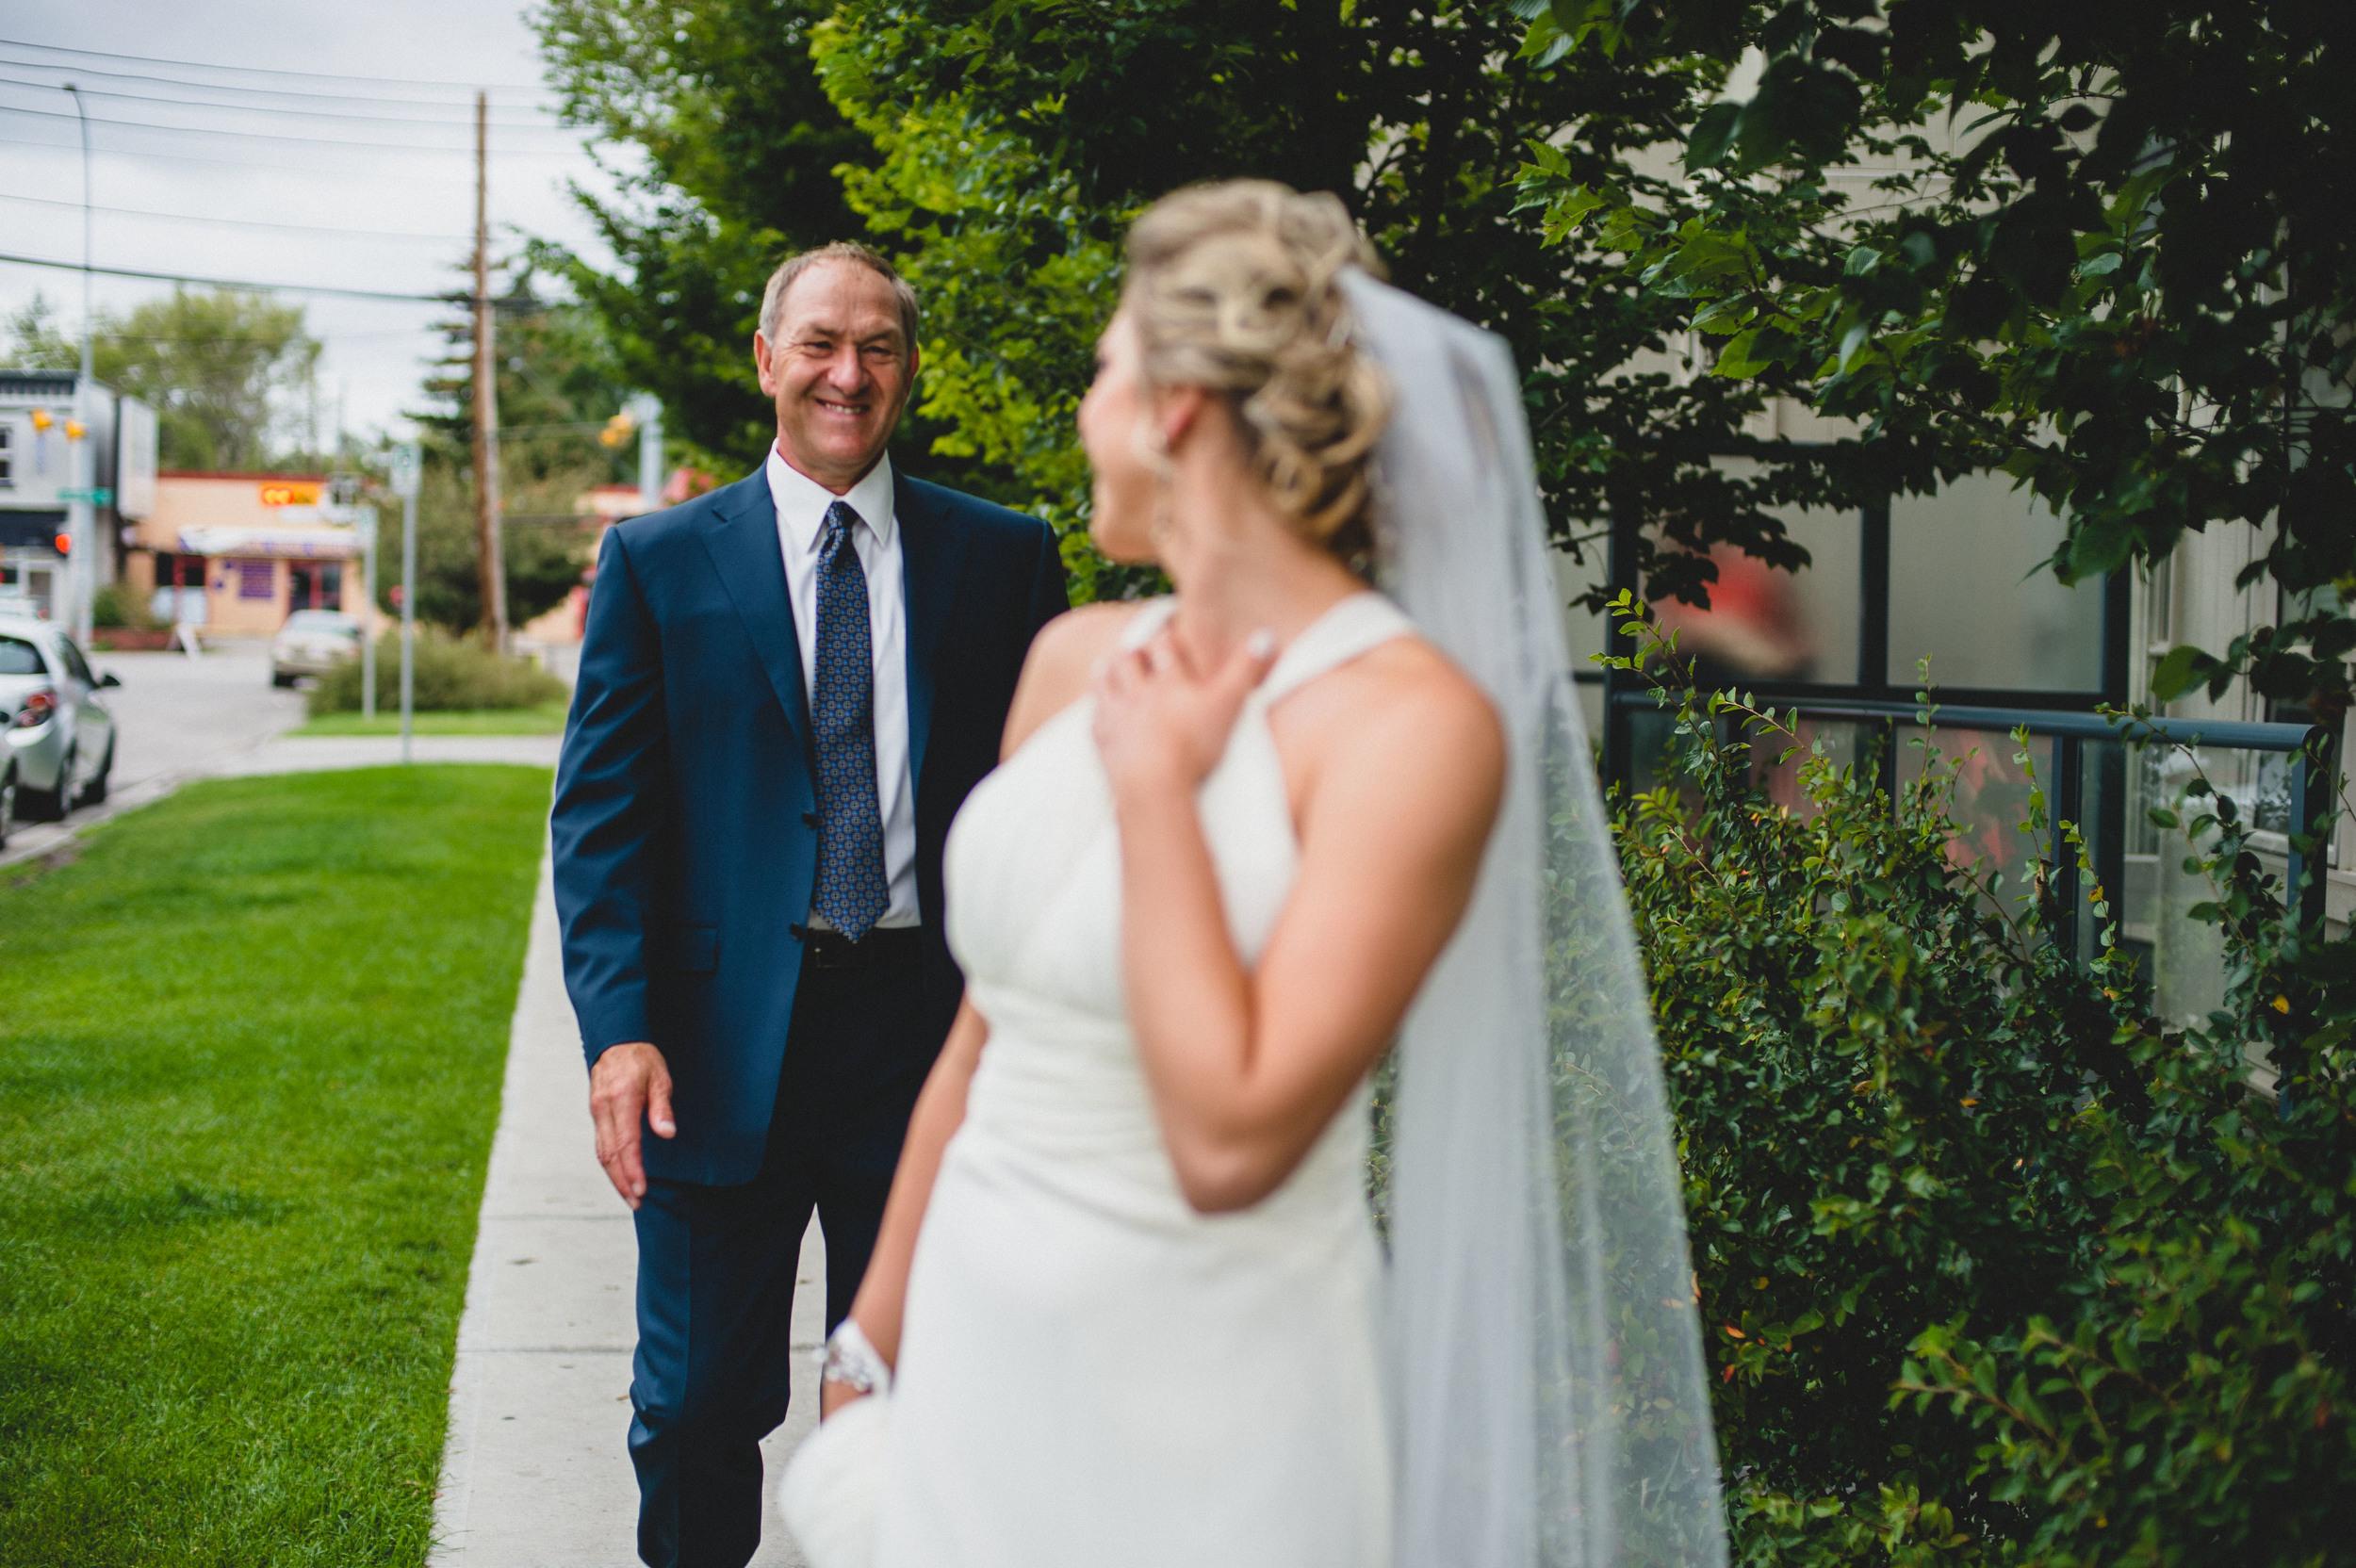 Vancouevr wedding photography edward lai photogrpaher -3.jpg